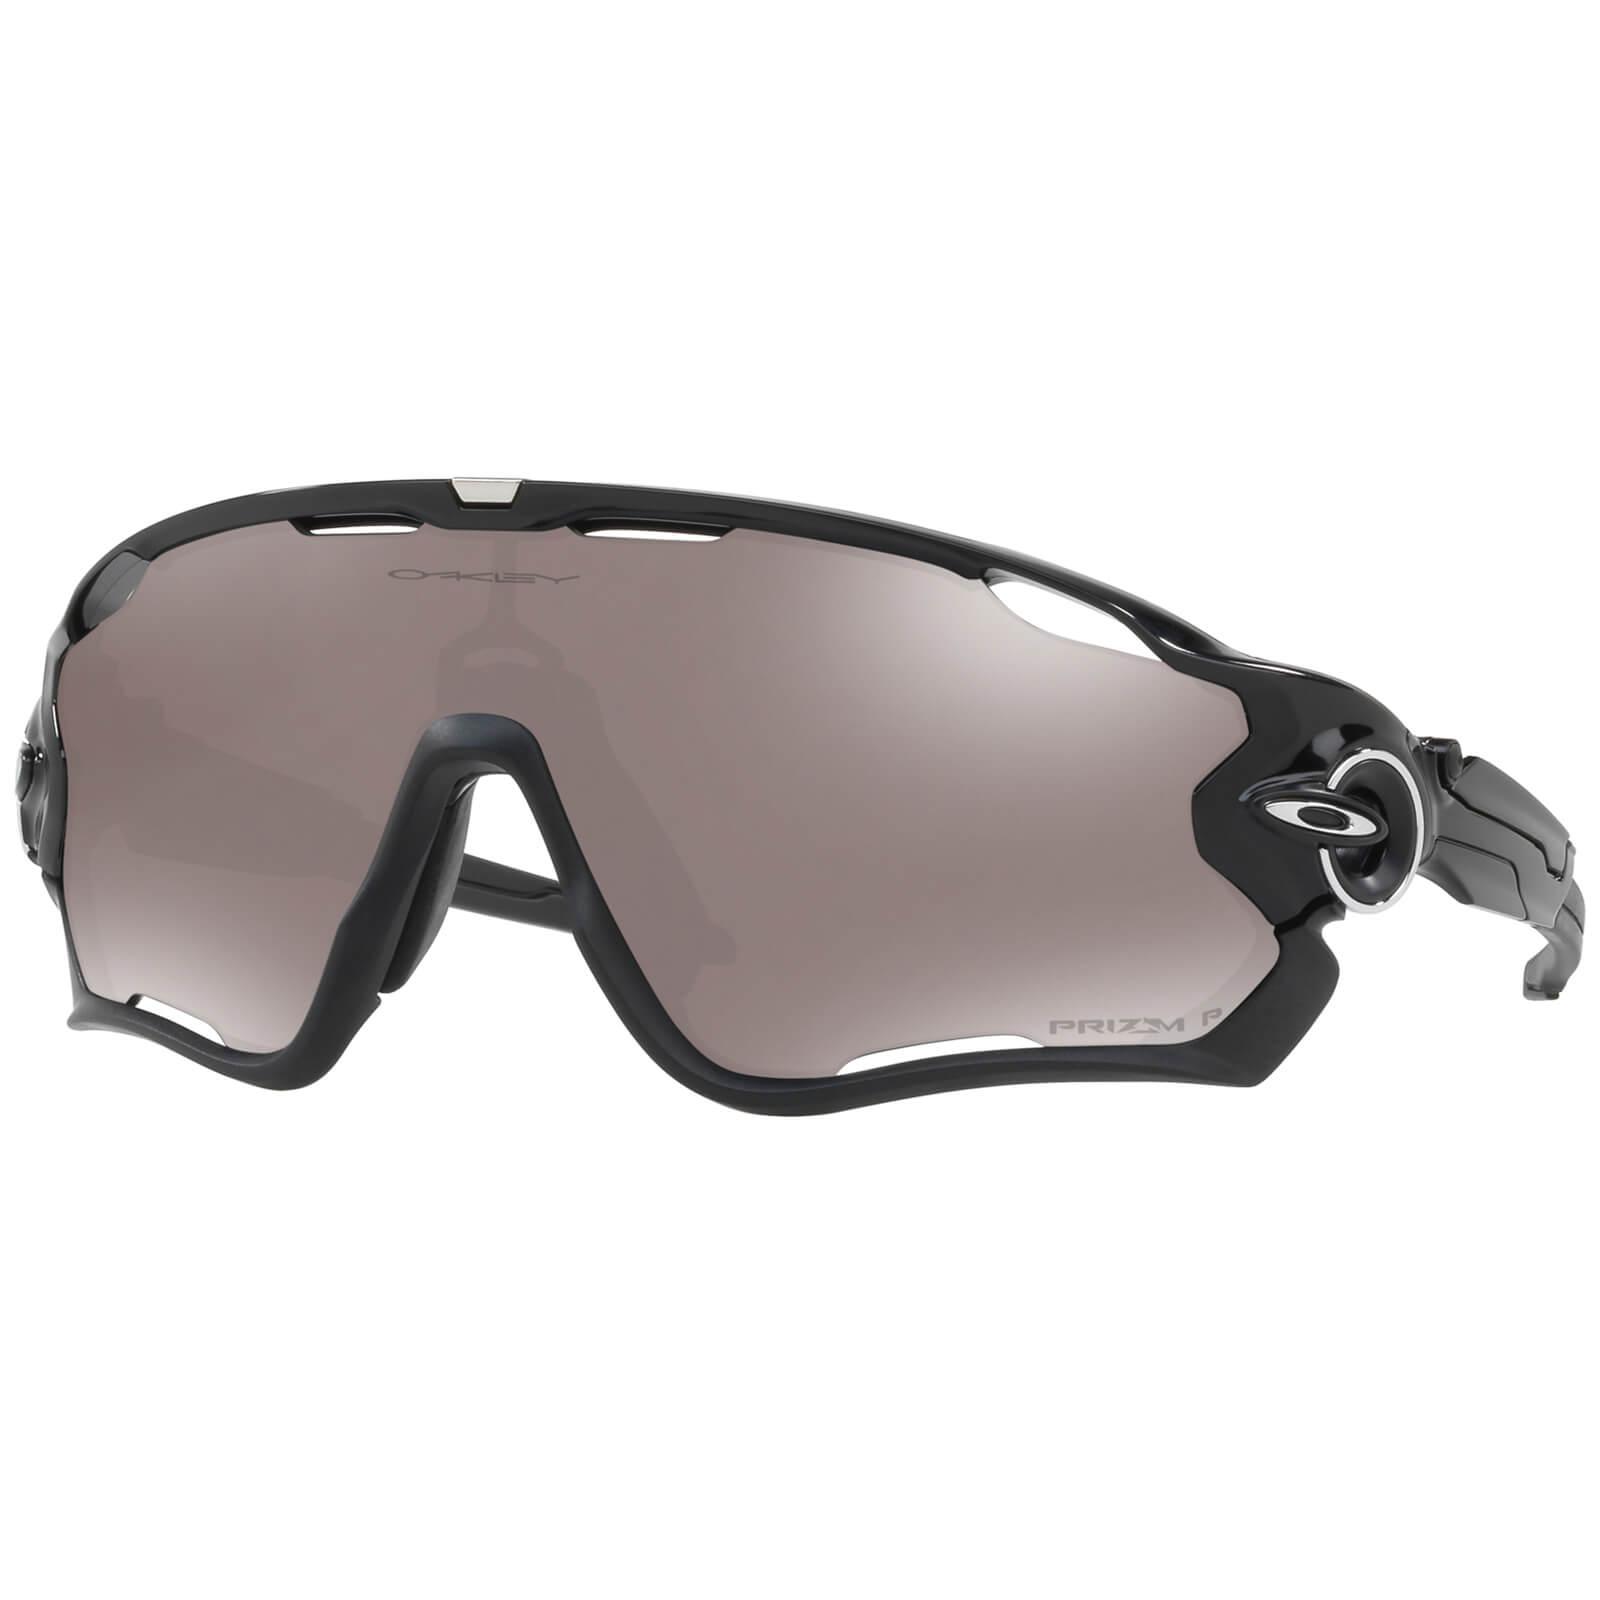 4b870feba0 Oakley Jawbreaker Polarised Sunglasses - Polished Black Prizm Black ...